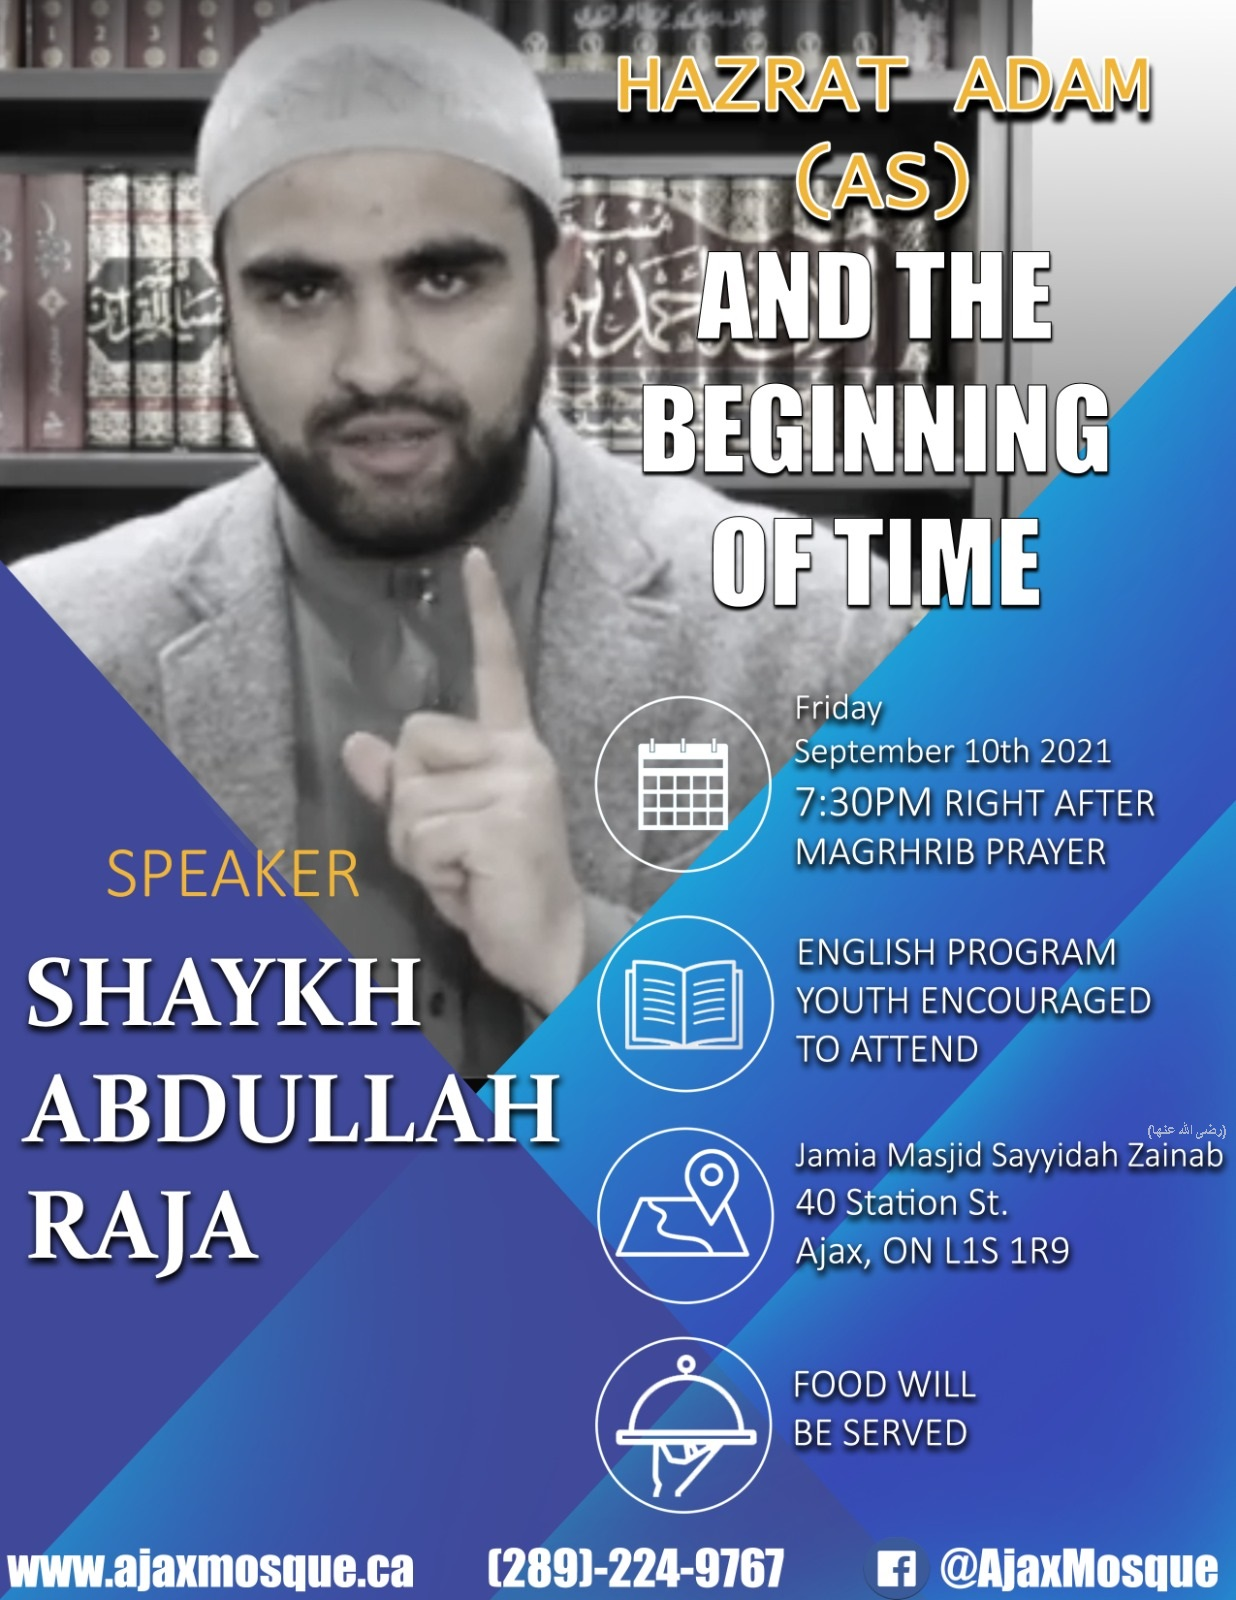 Hazrat Adam (عليه السلام) and the beginning of time